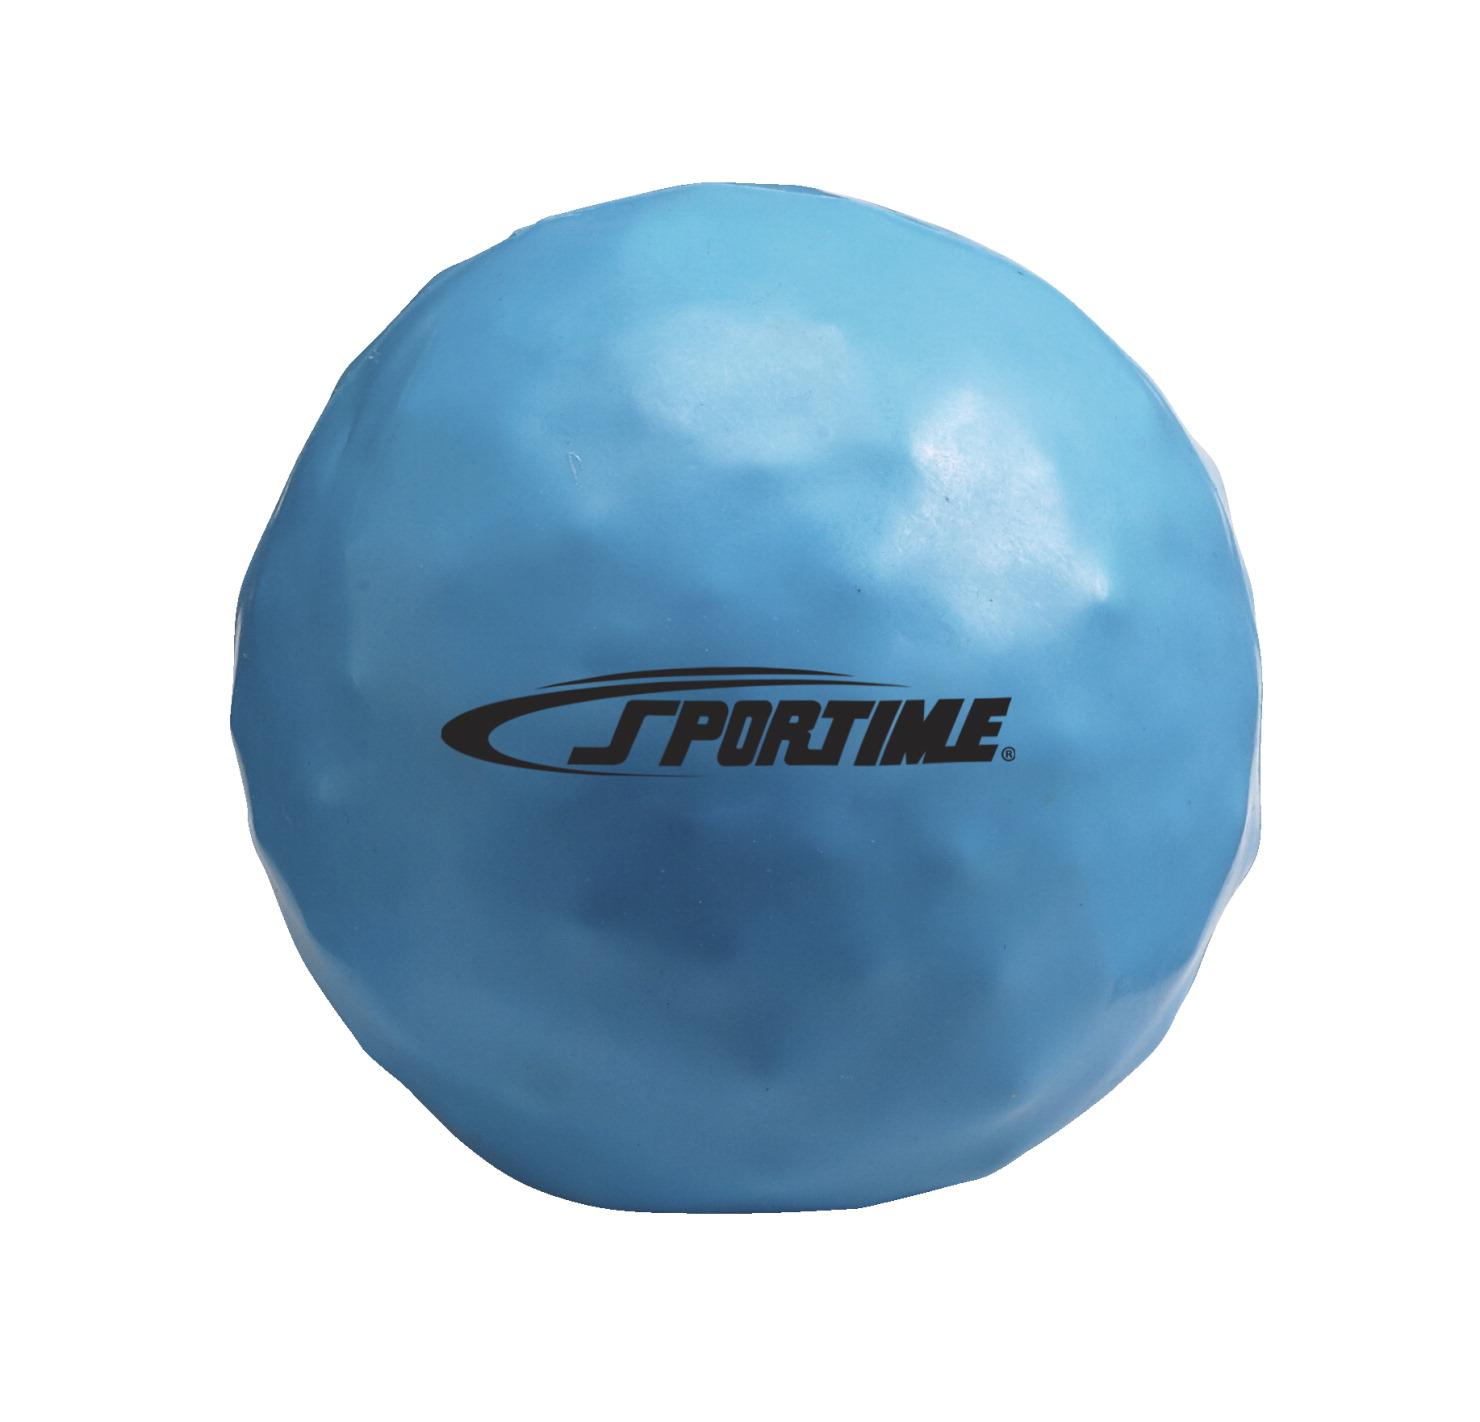 Sportime Yuk-E-Ball Medicine Ball, 3-1/3 Pounds, 6-1/2 Inches, Blue at Sears.com